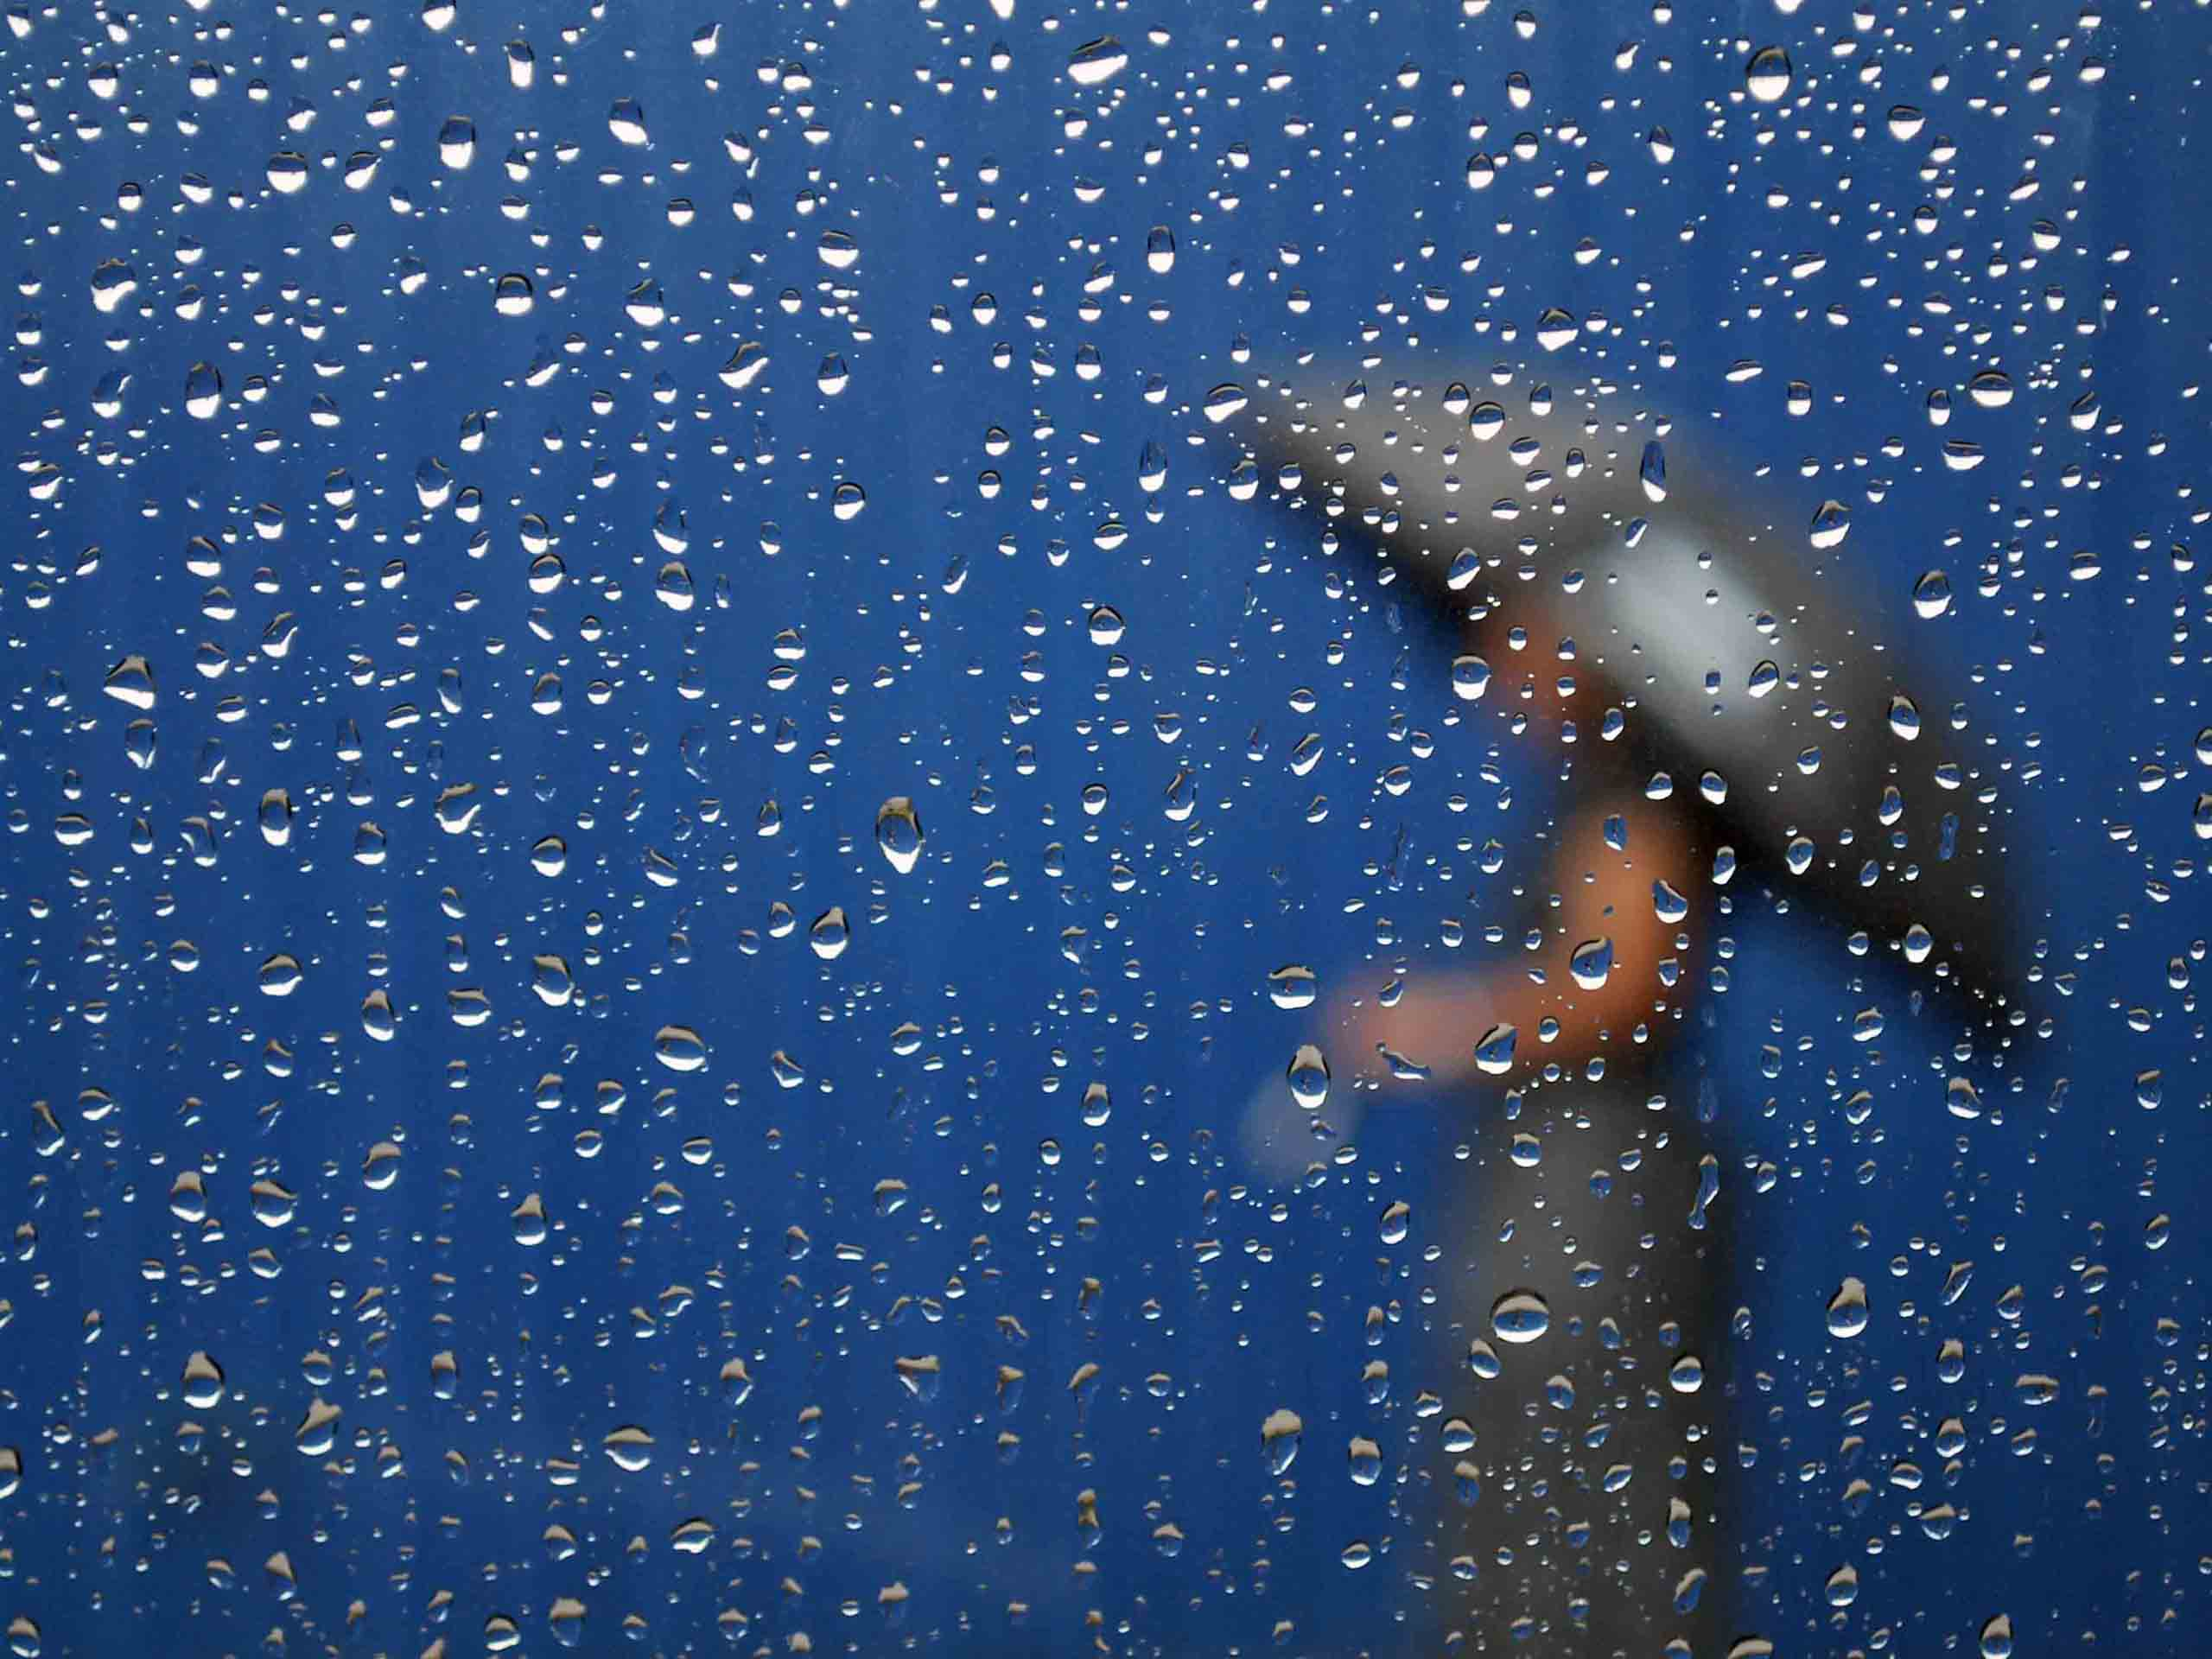 photos computer background rain spring backgrounds desktop wallpaper 2560x1920